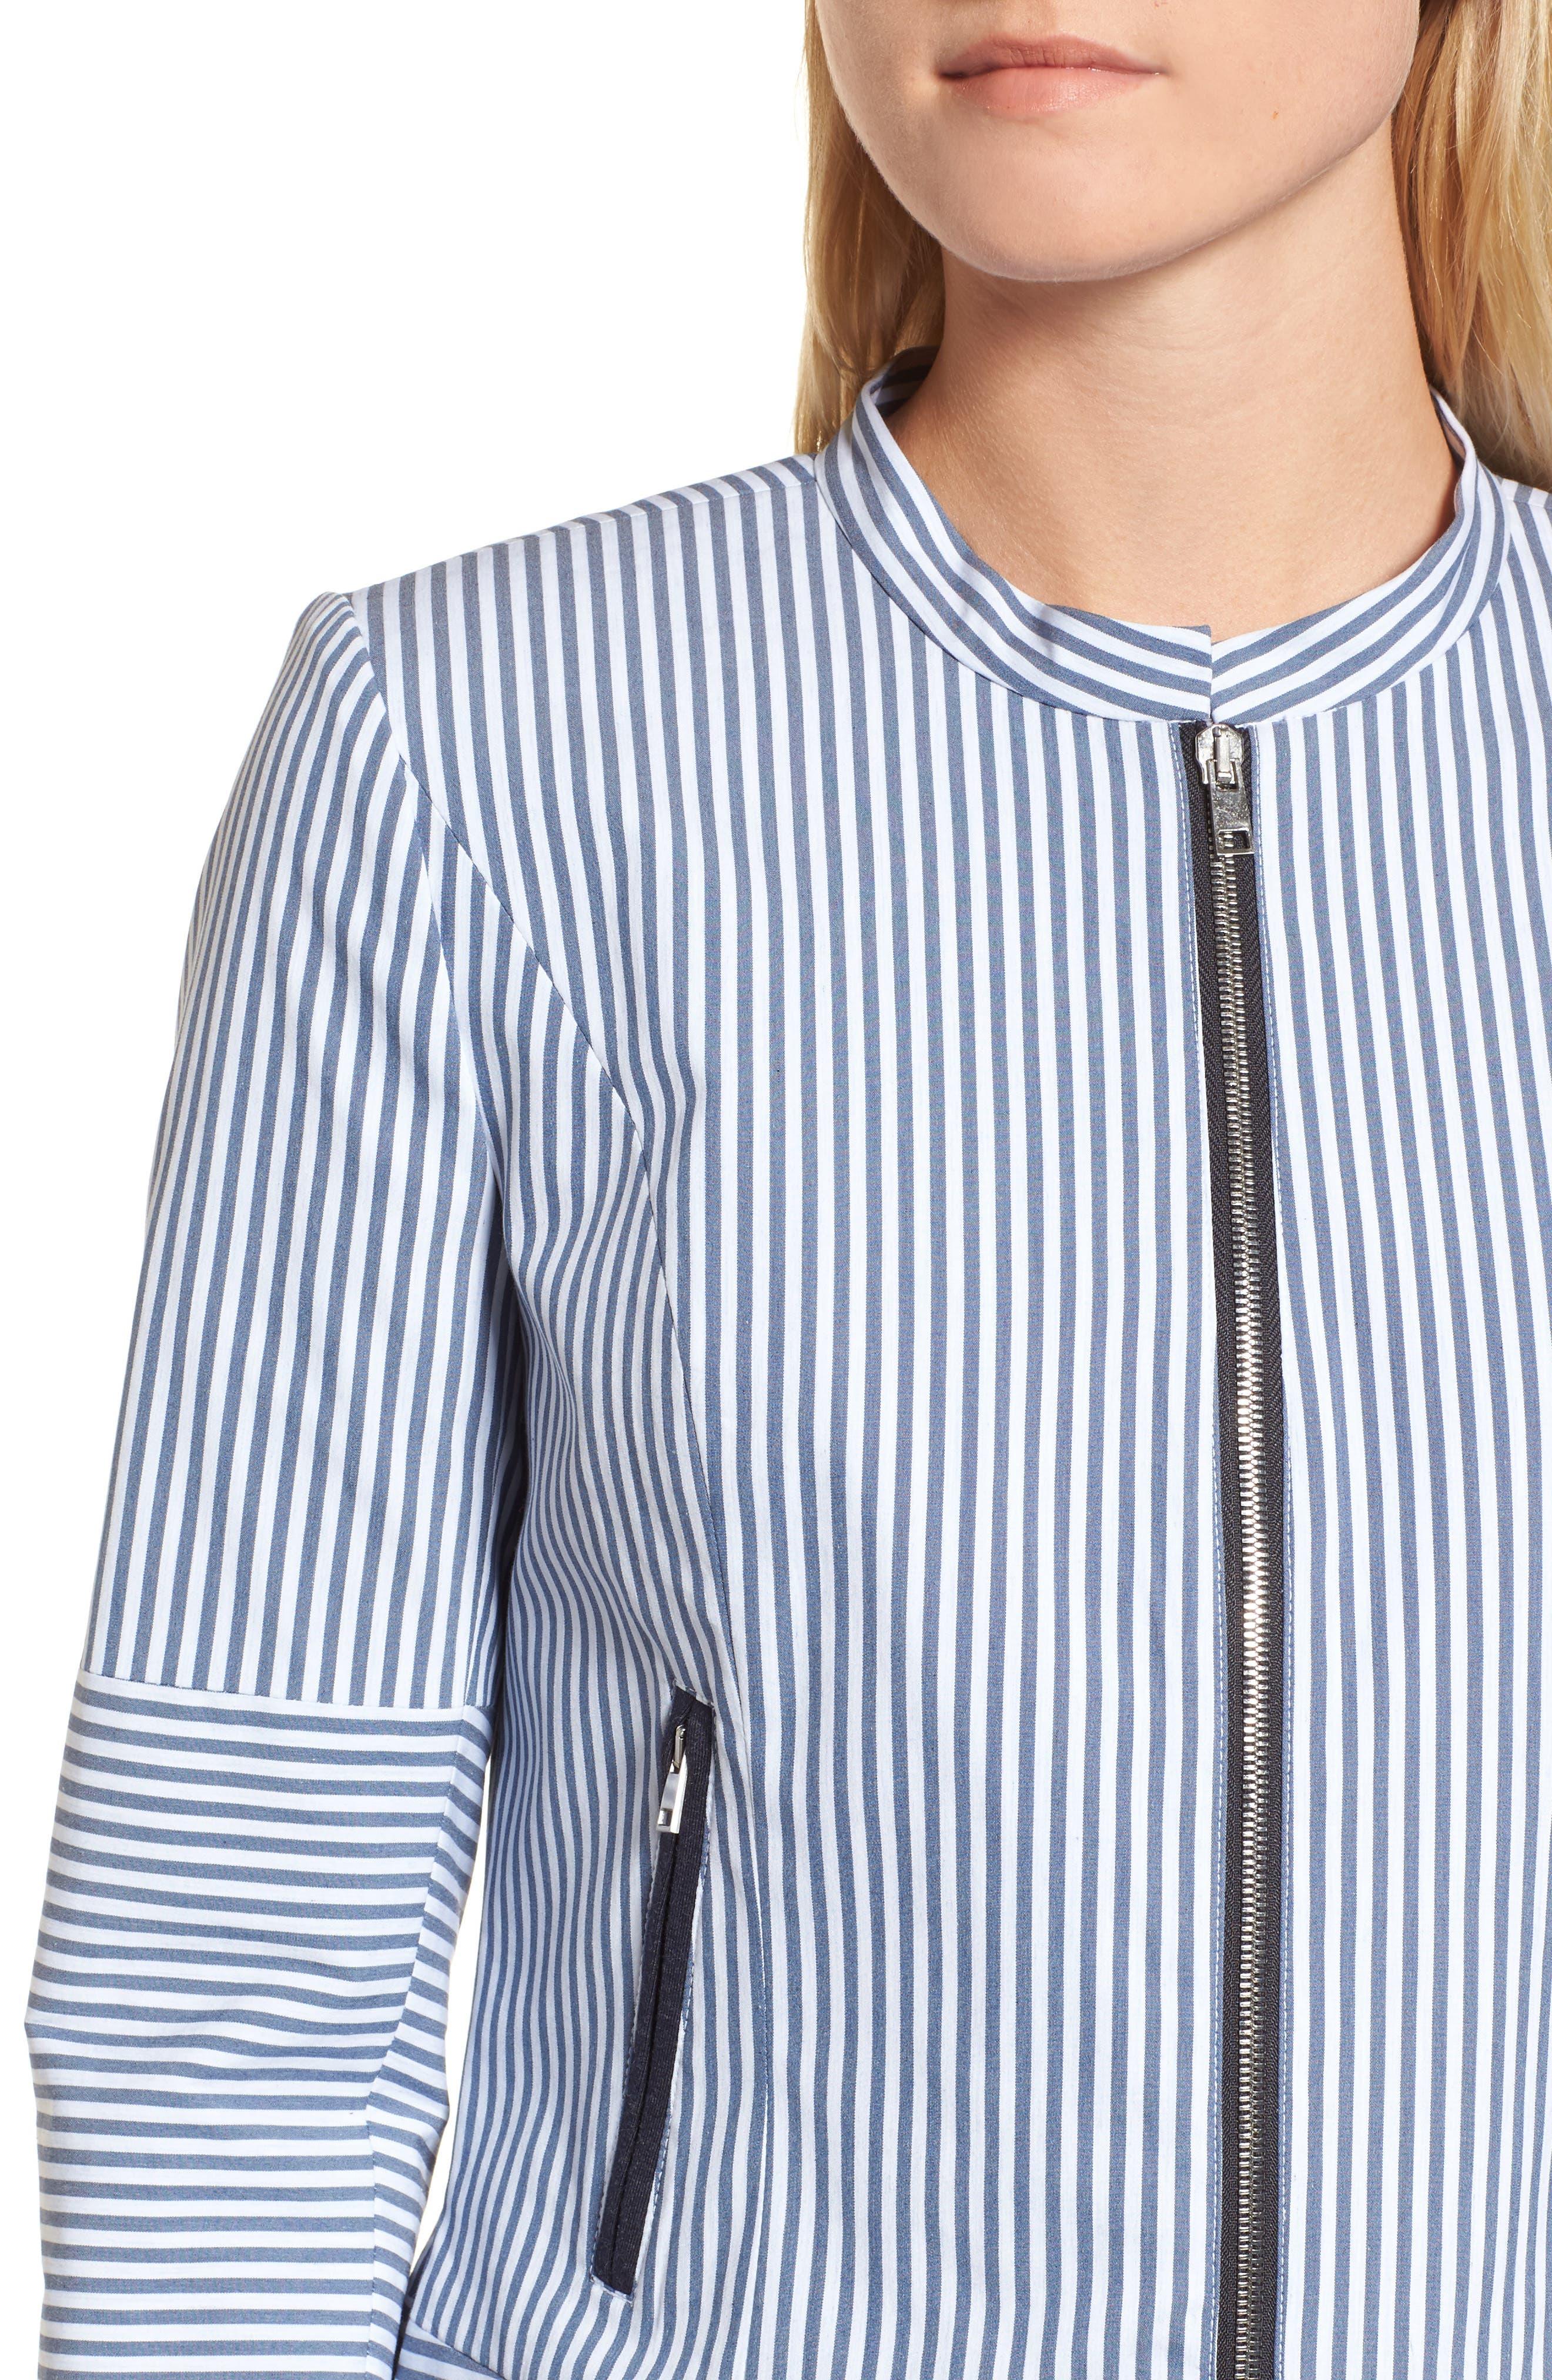 Stripe Jacket,                             Alternate thumbnail 4, color,                             410